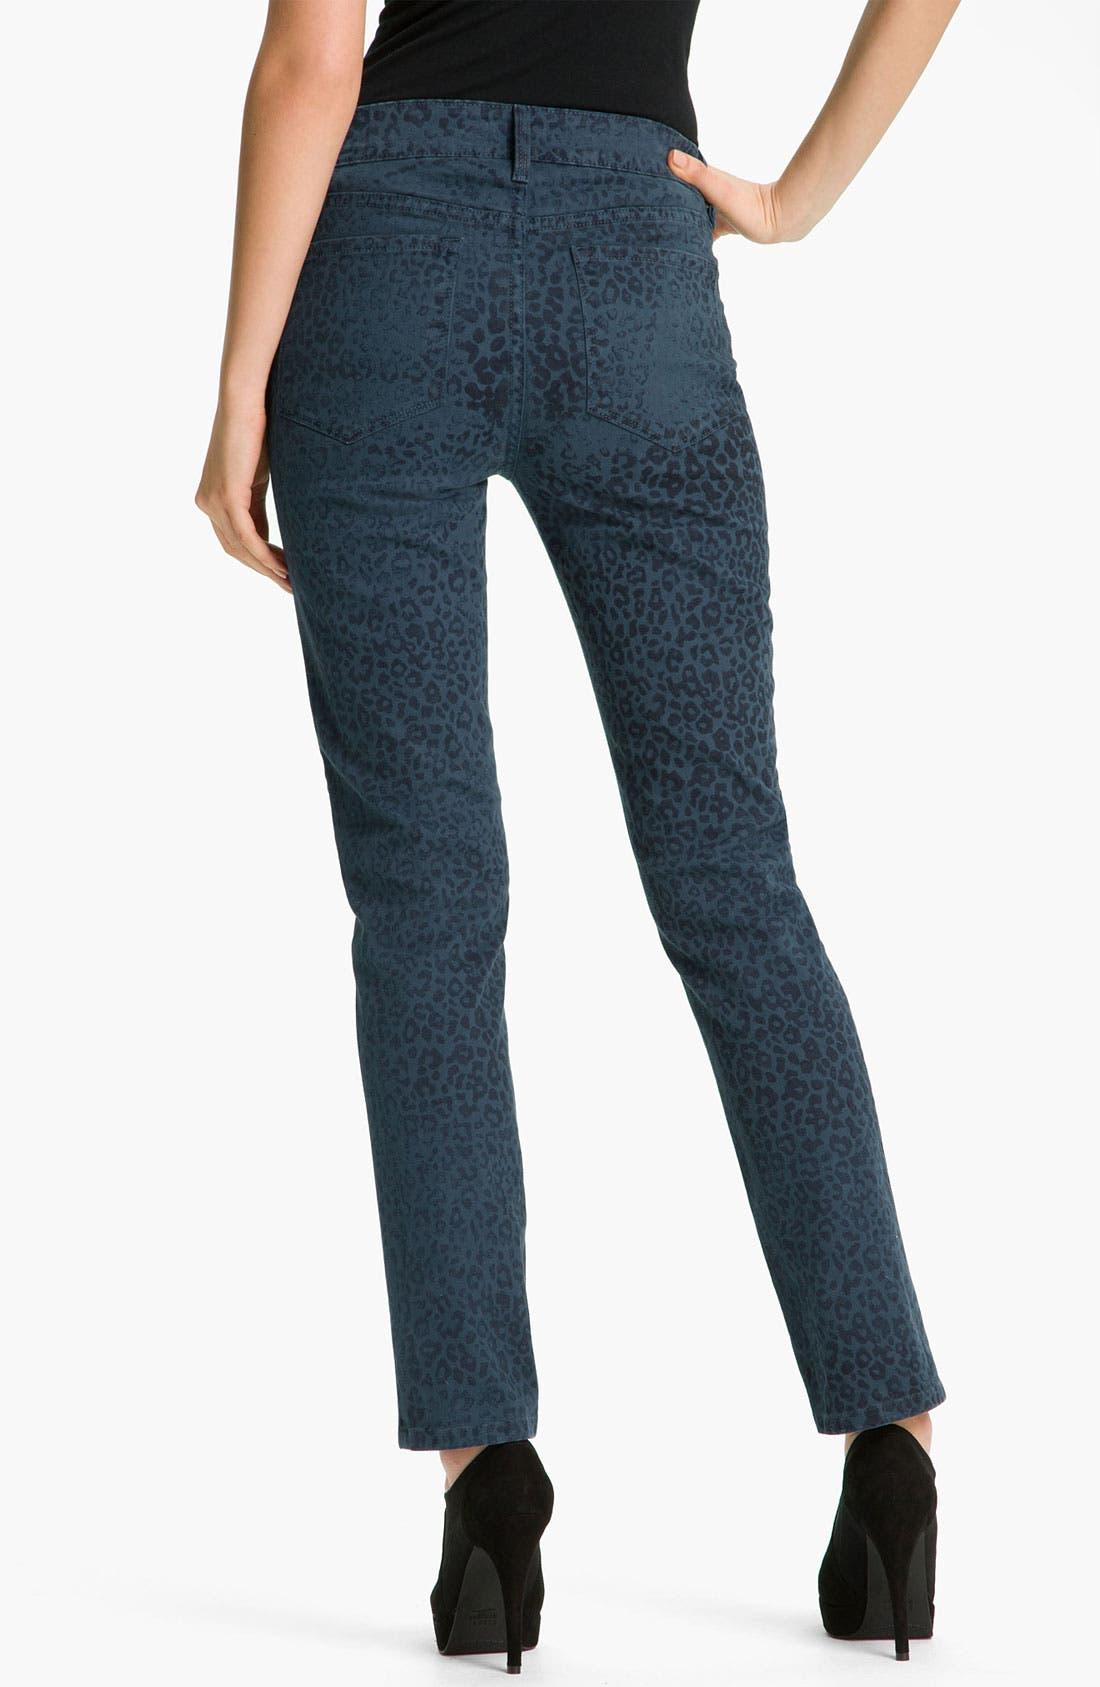 Alternate Image 2  - NYDJ 'Sheri - Cheetah' Print Skinny Twill Jeans